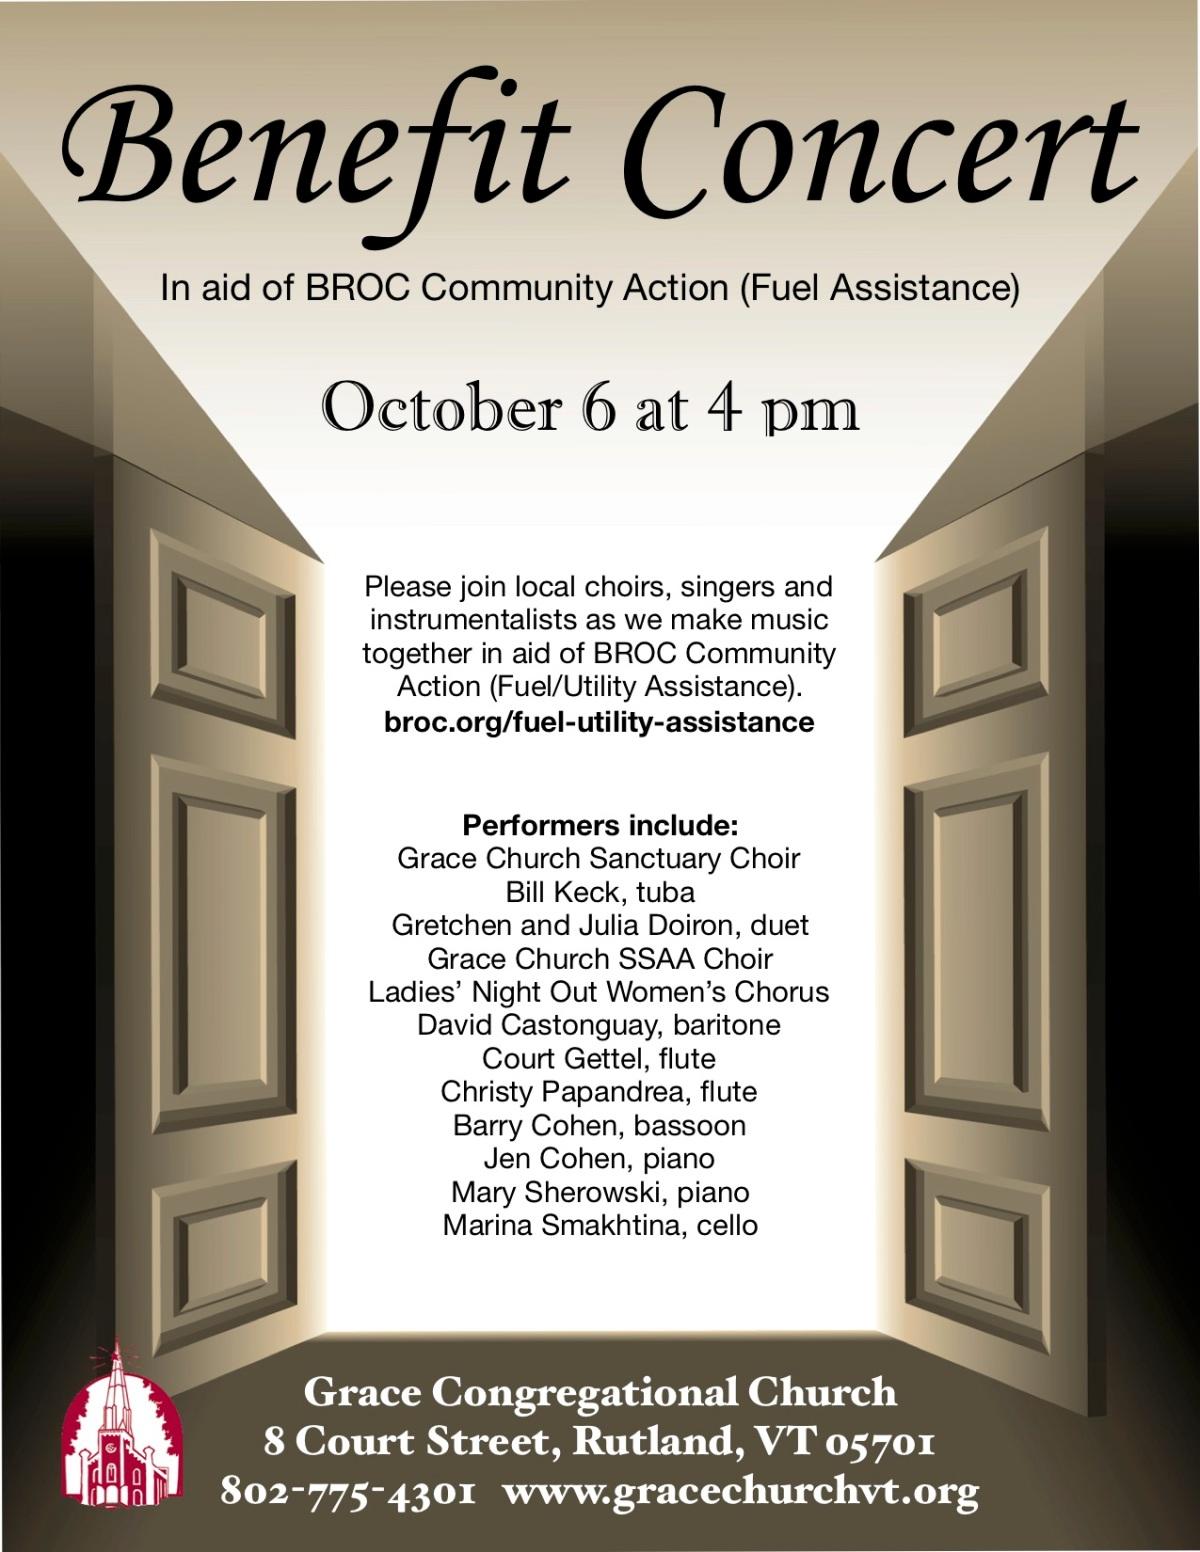 Oct. 6 ~ BenefitConcert